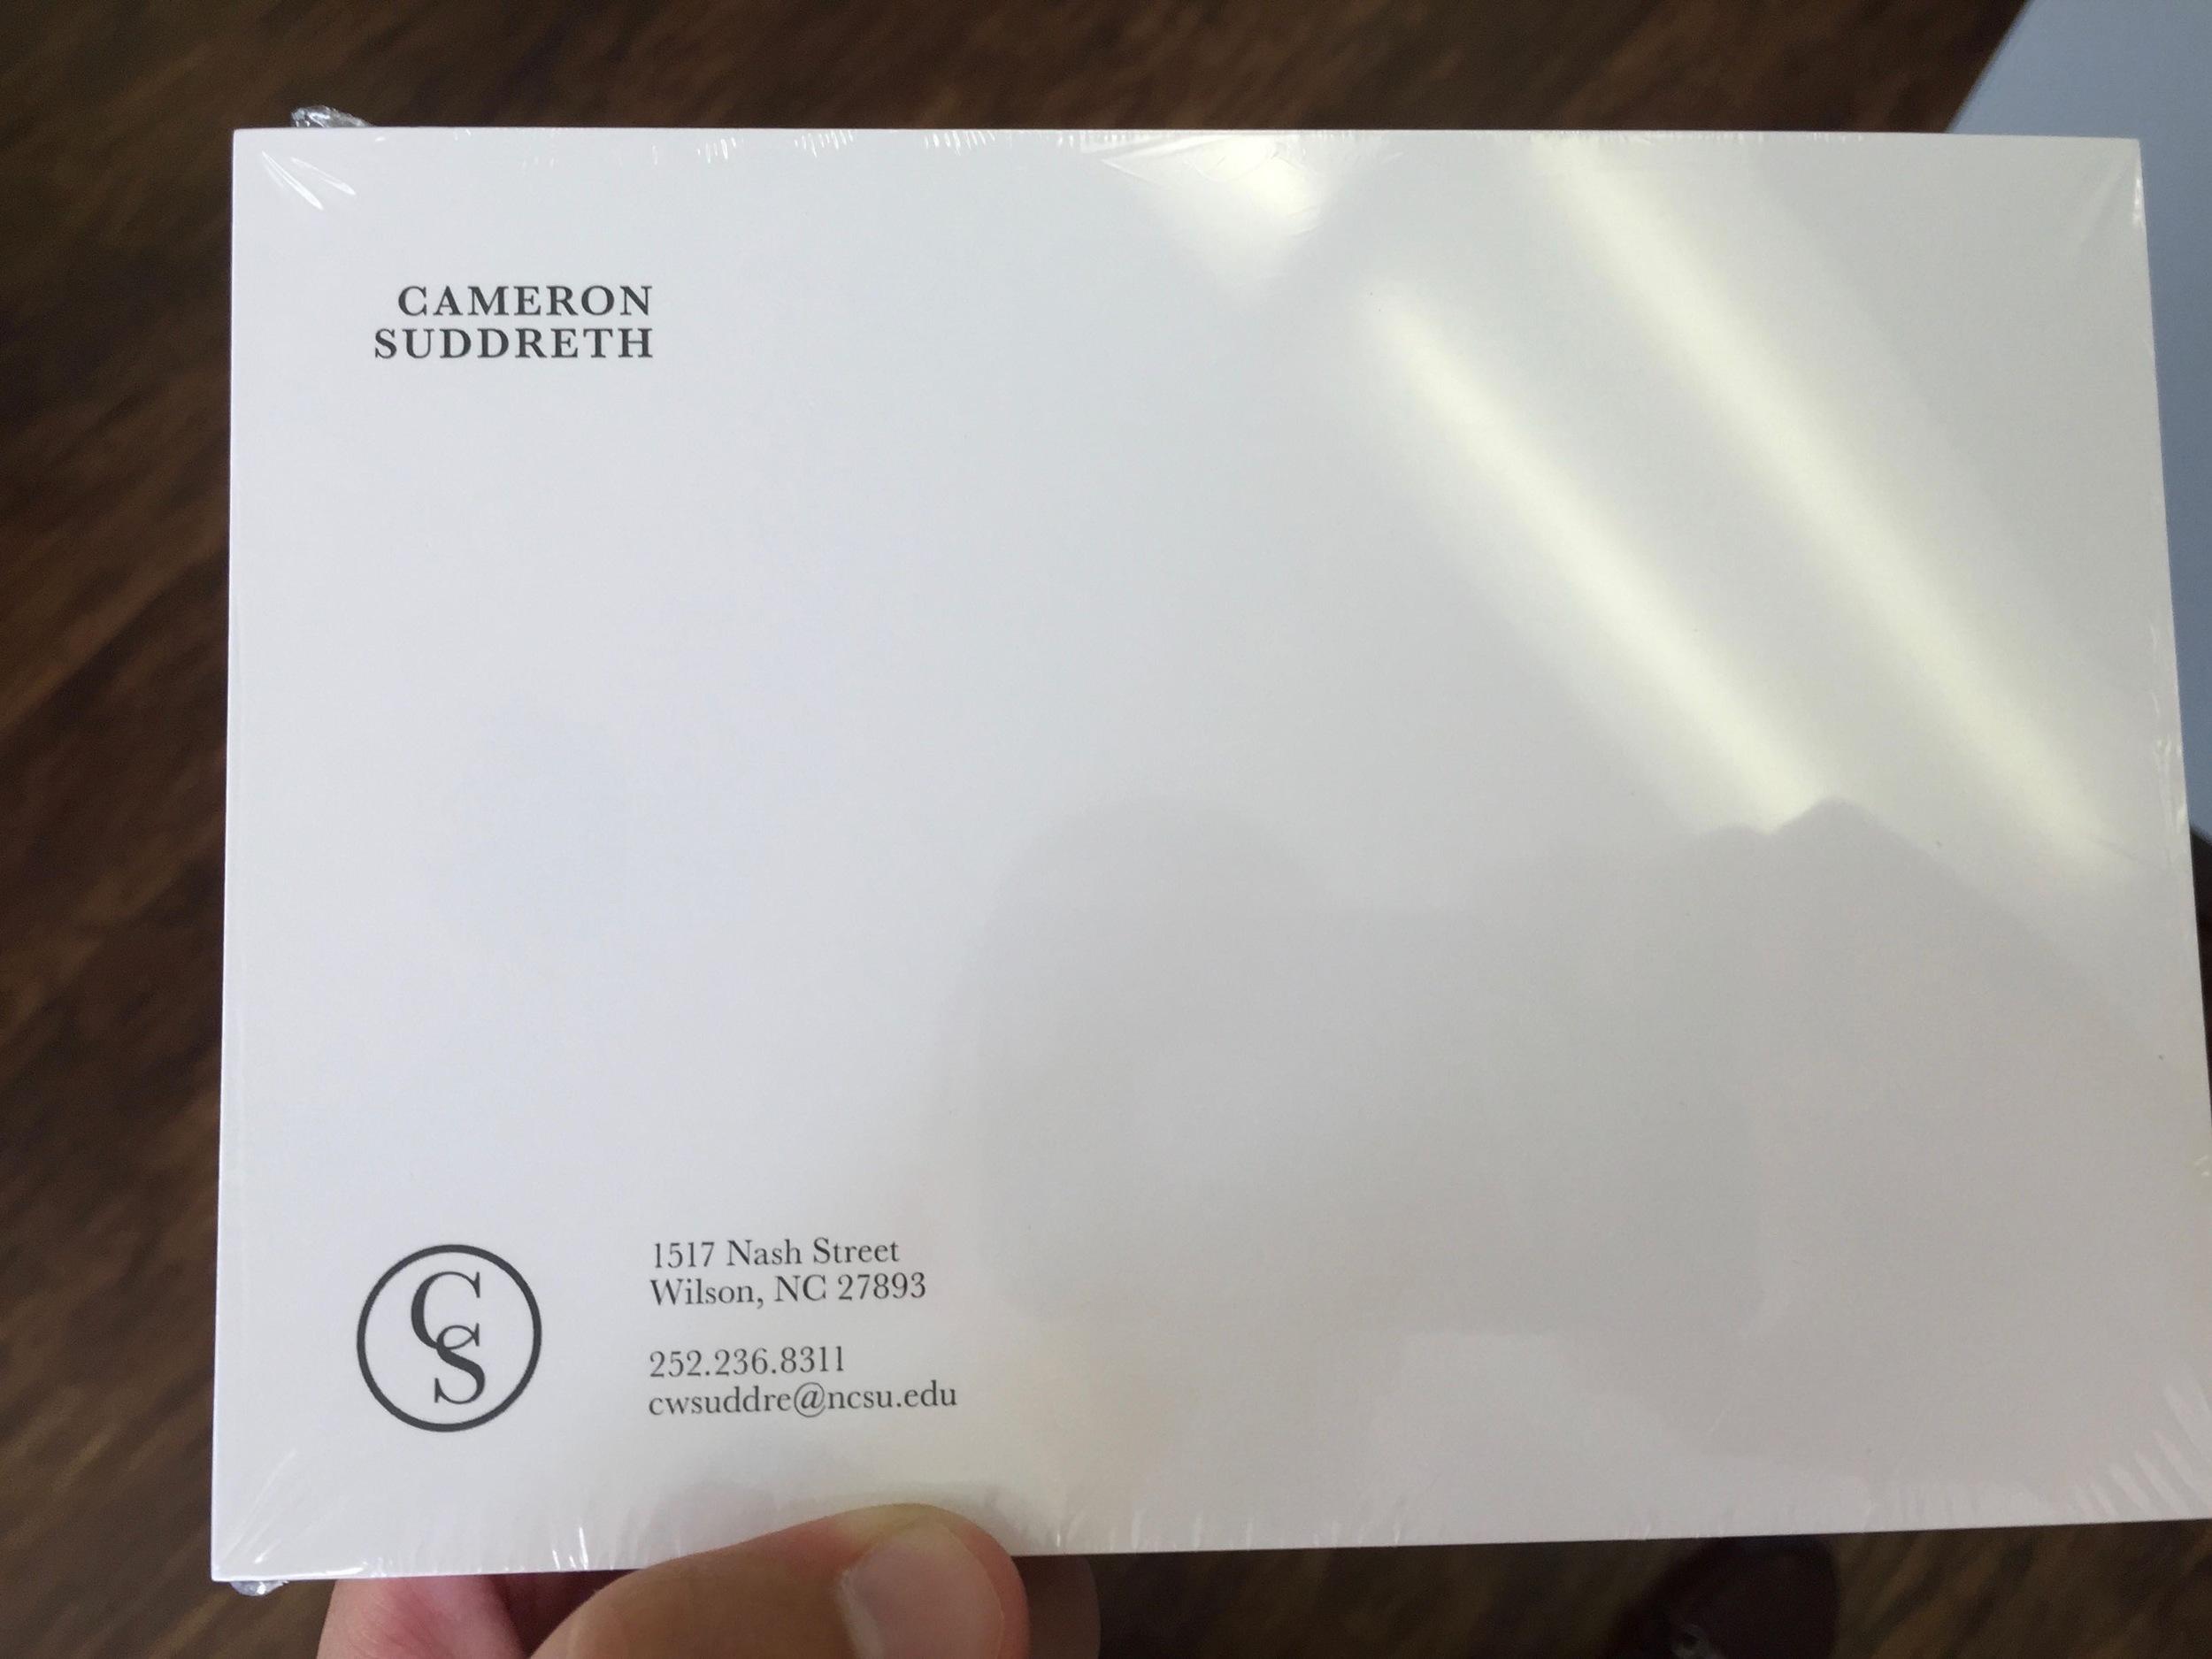 Note card - Printed